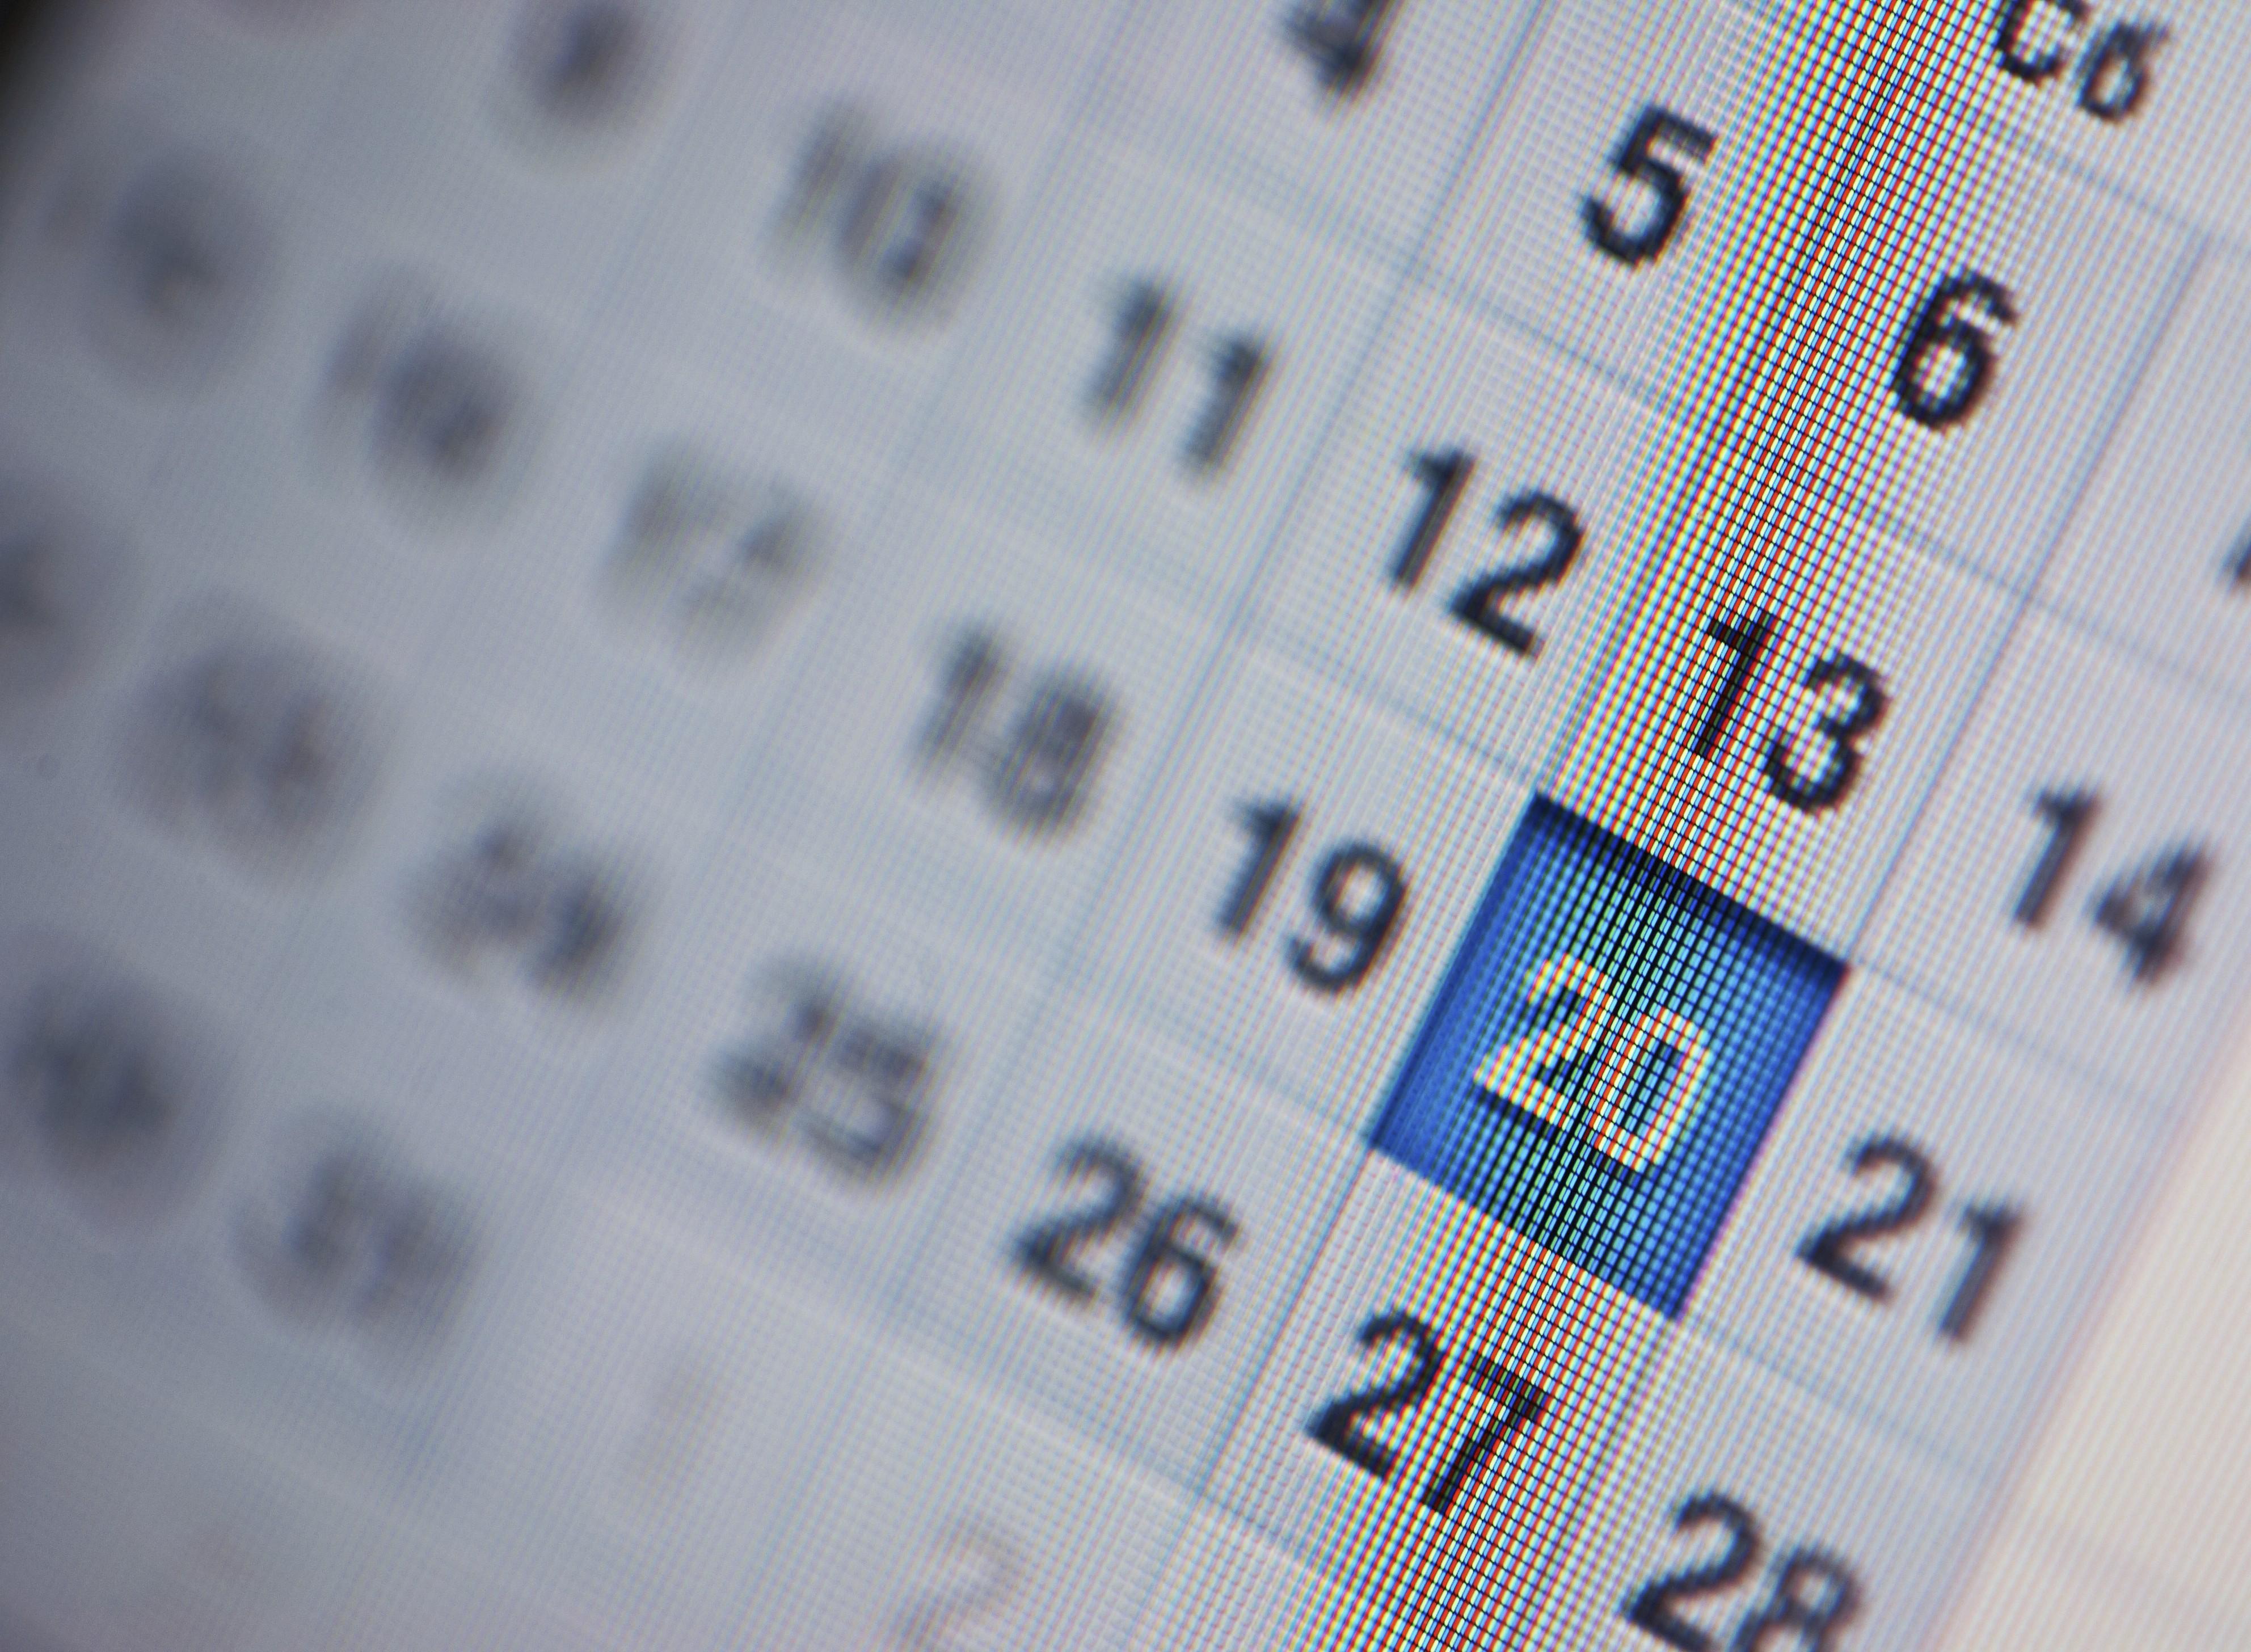 March Calendar Doodles Más Arriba-a-fecha Online Calendar tool Lara Expolicenciaslatam Of March Calendar Doodles Más Caliente Free Printable 2017 Calendar Printables Pinterest